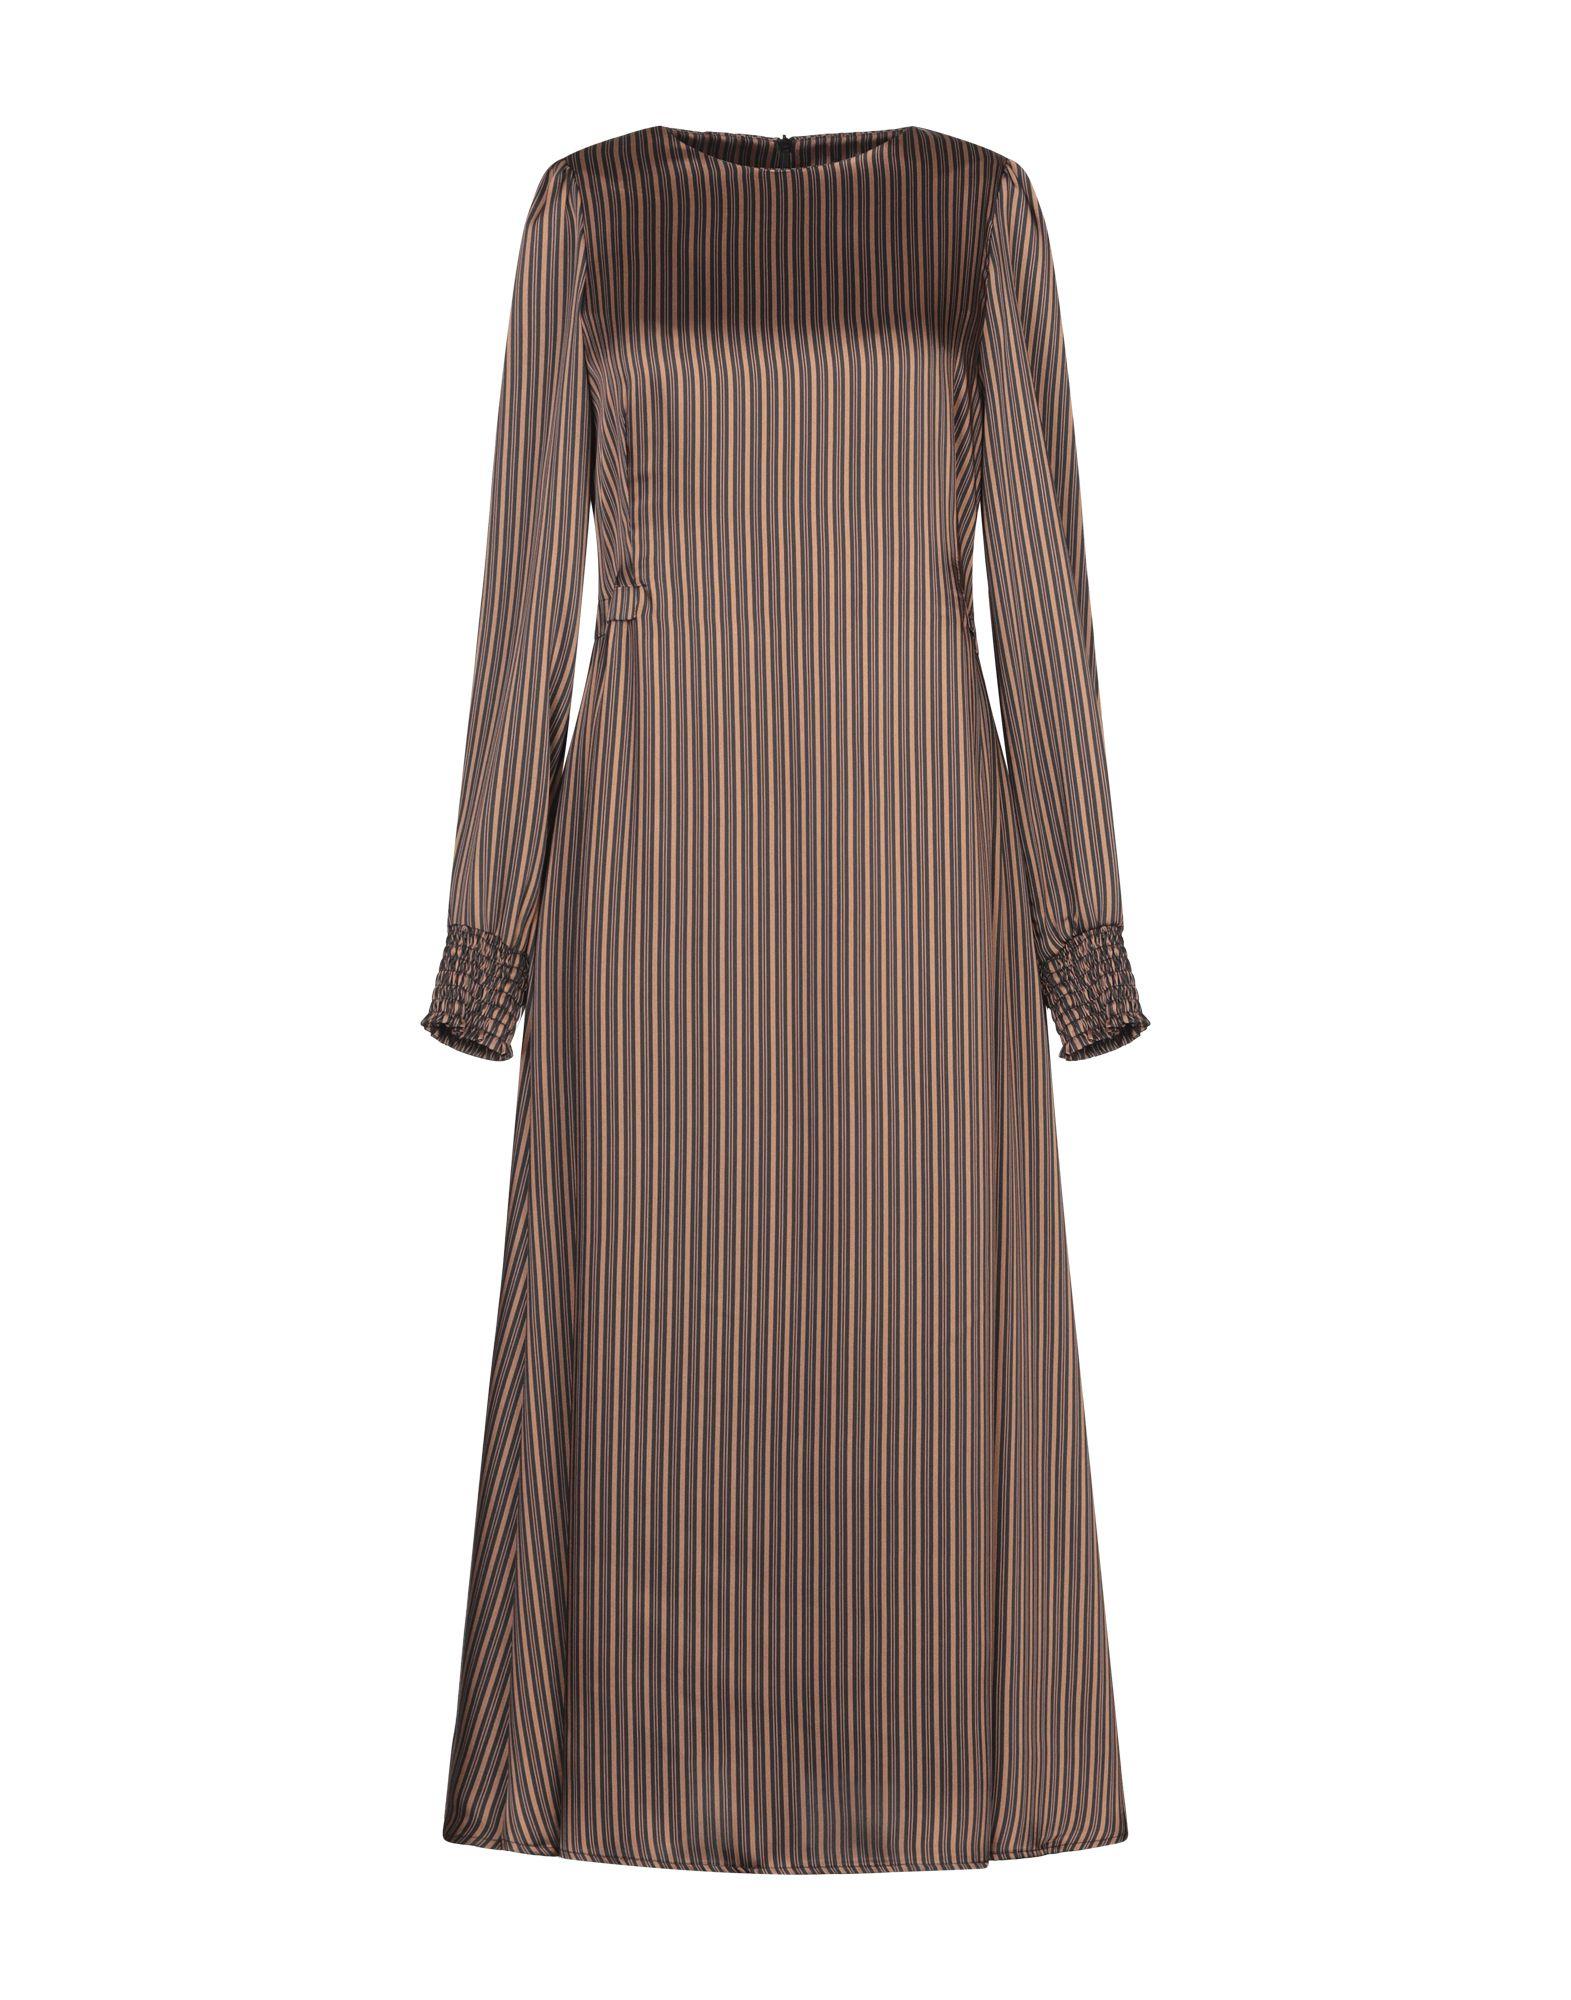 BIANCOGHIACCIO Платье длиной 3/4